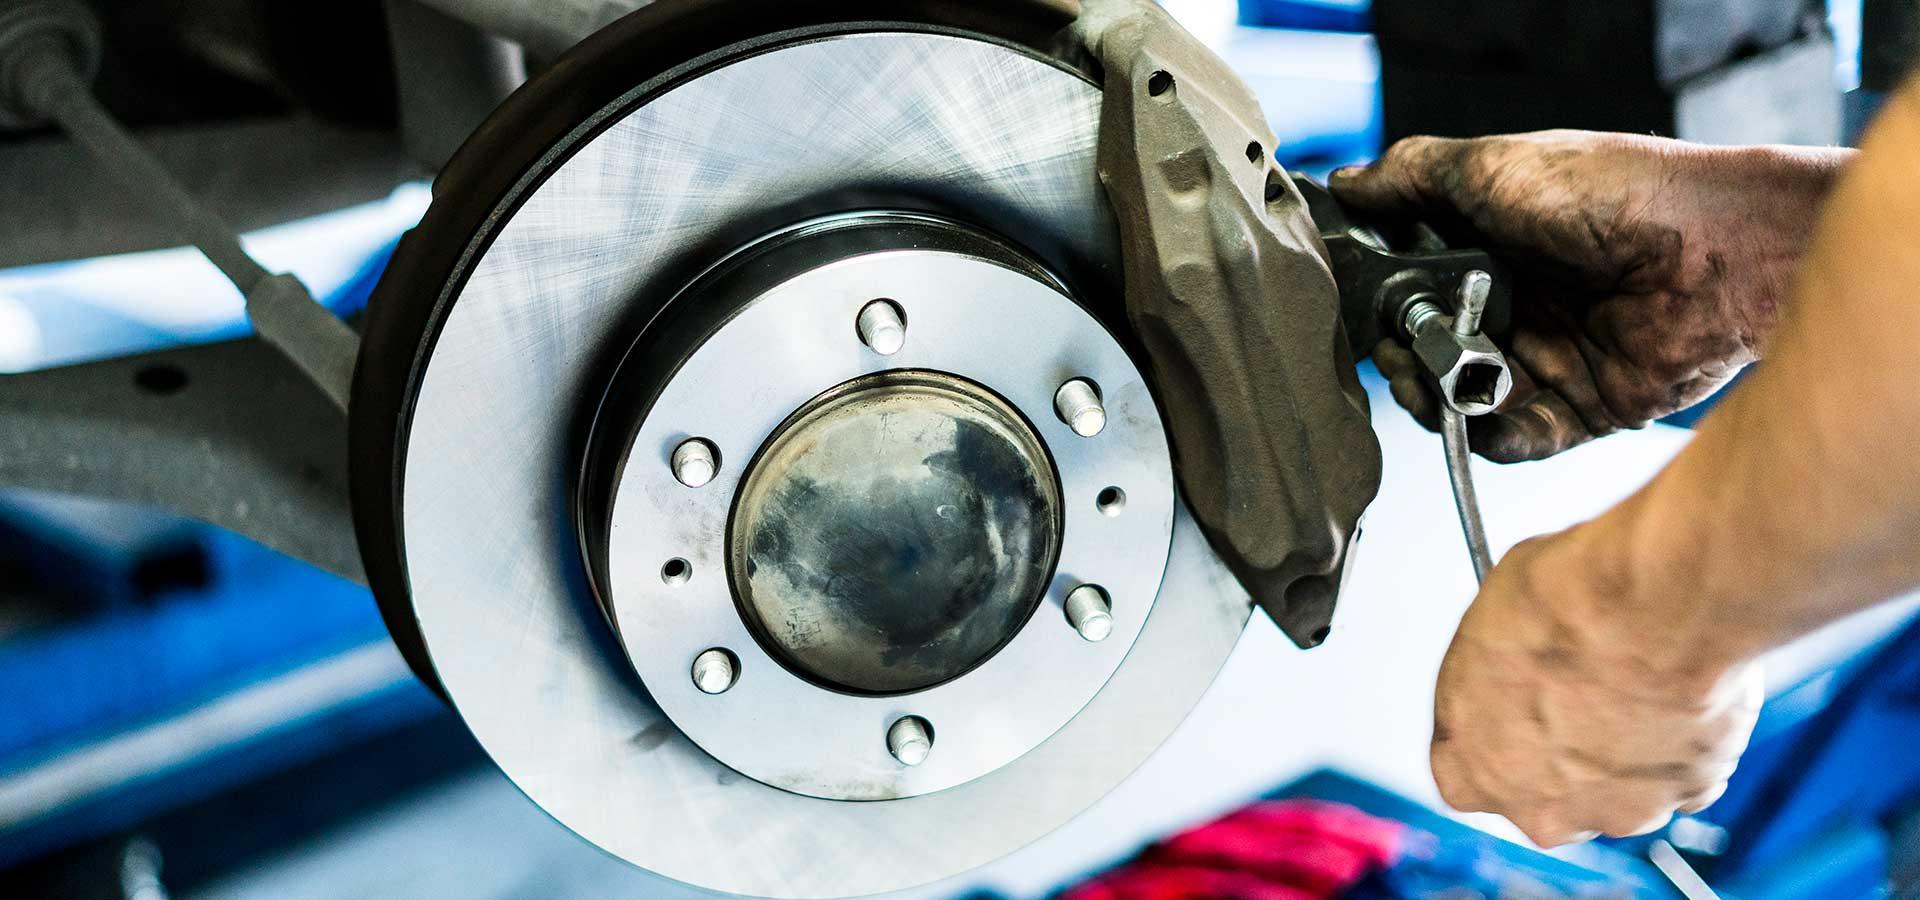 Turkia Auto Maintenance Workshop LLC